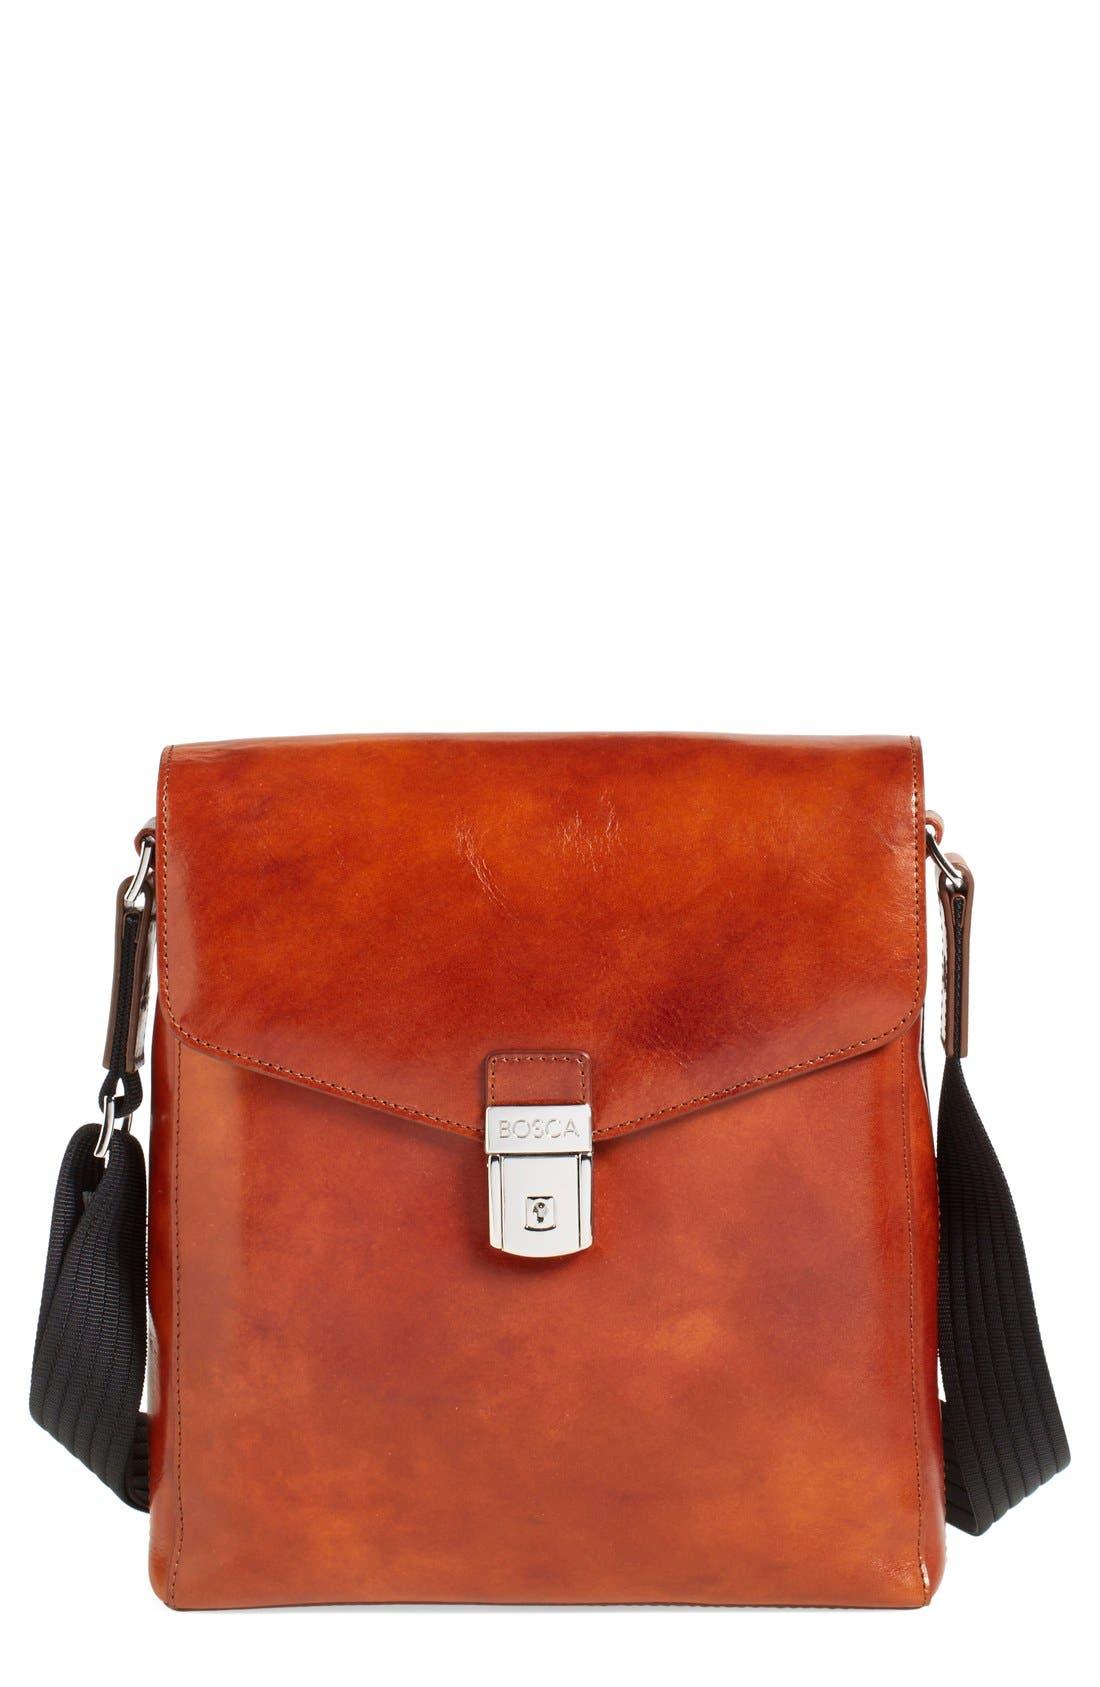 Bosca 'Man Bag' Leather Crossbody Bag